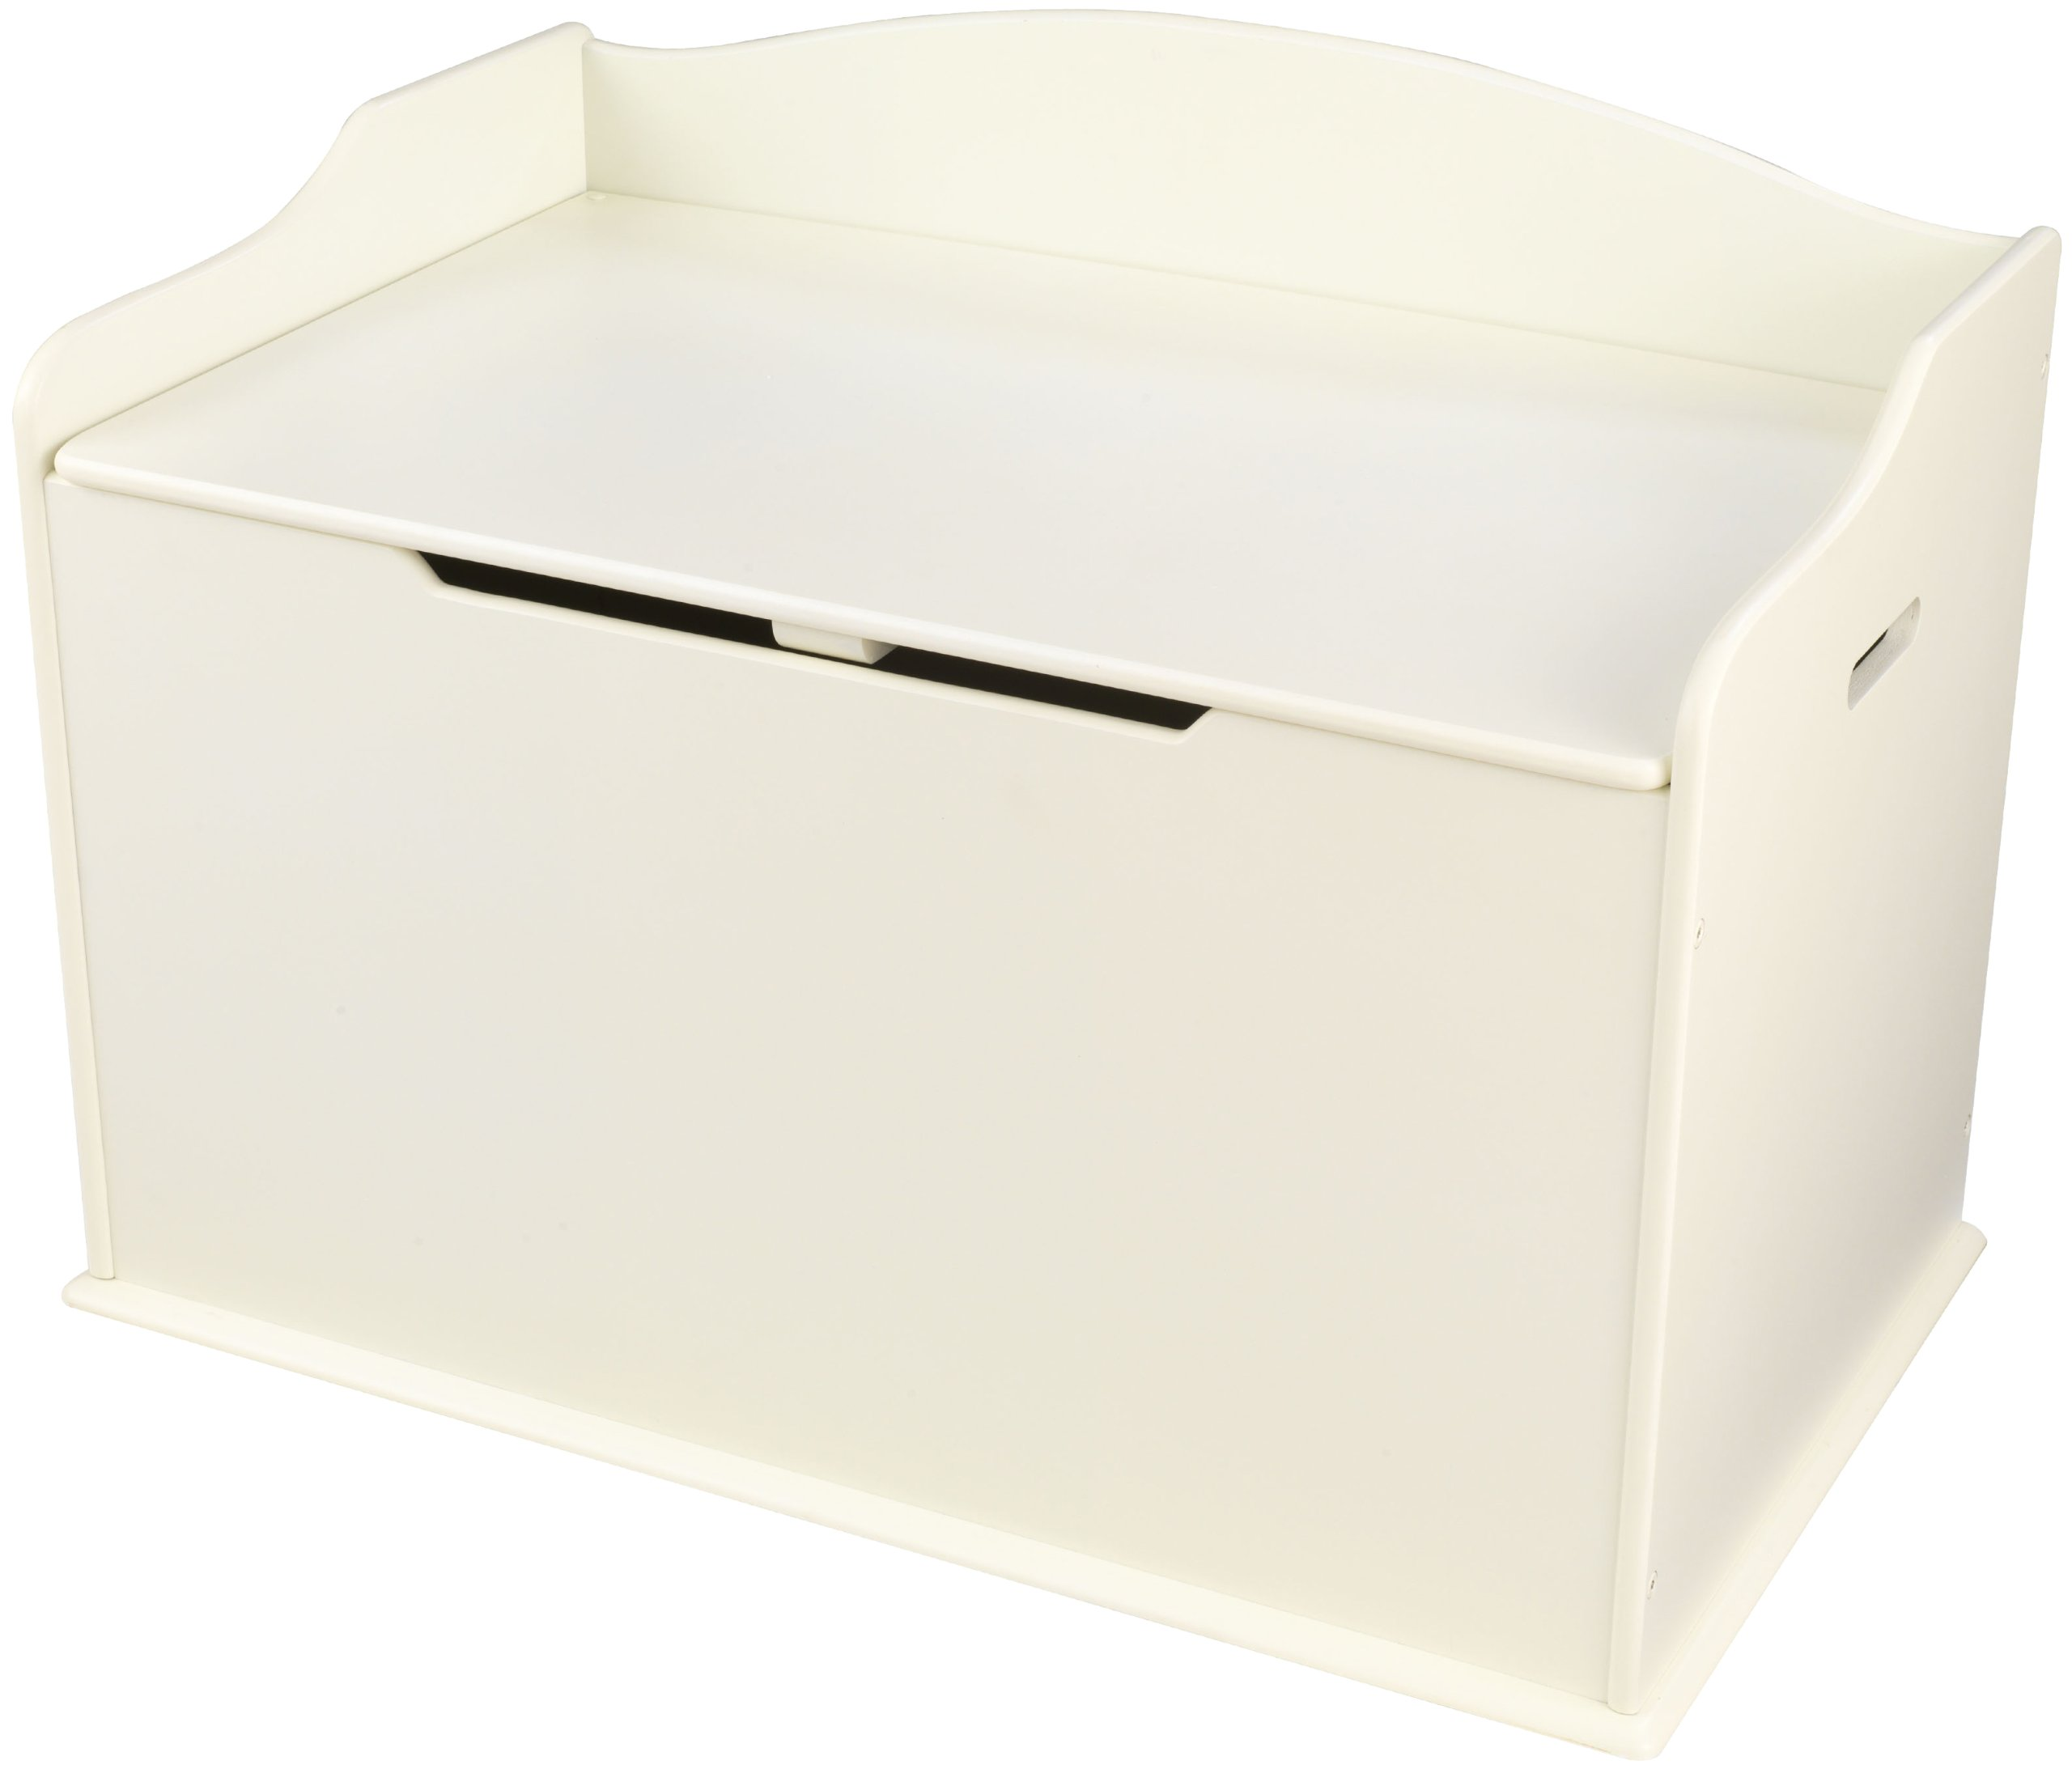 kidkraft austin toy box vanilla. Black Bedroom Furniture Sets. Home Design Ideas